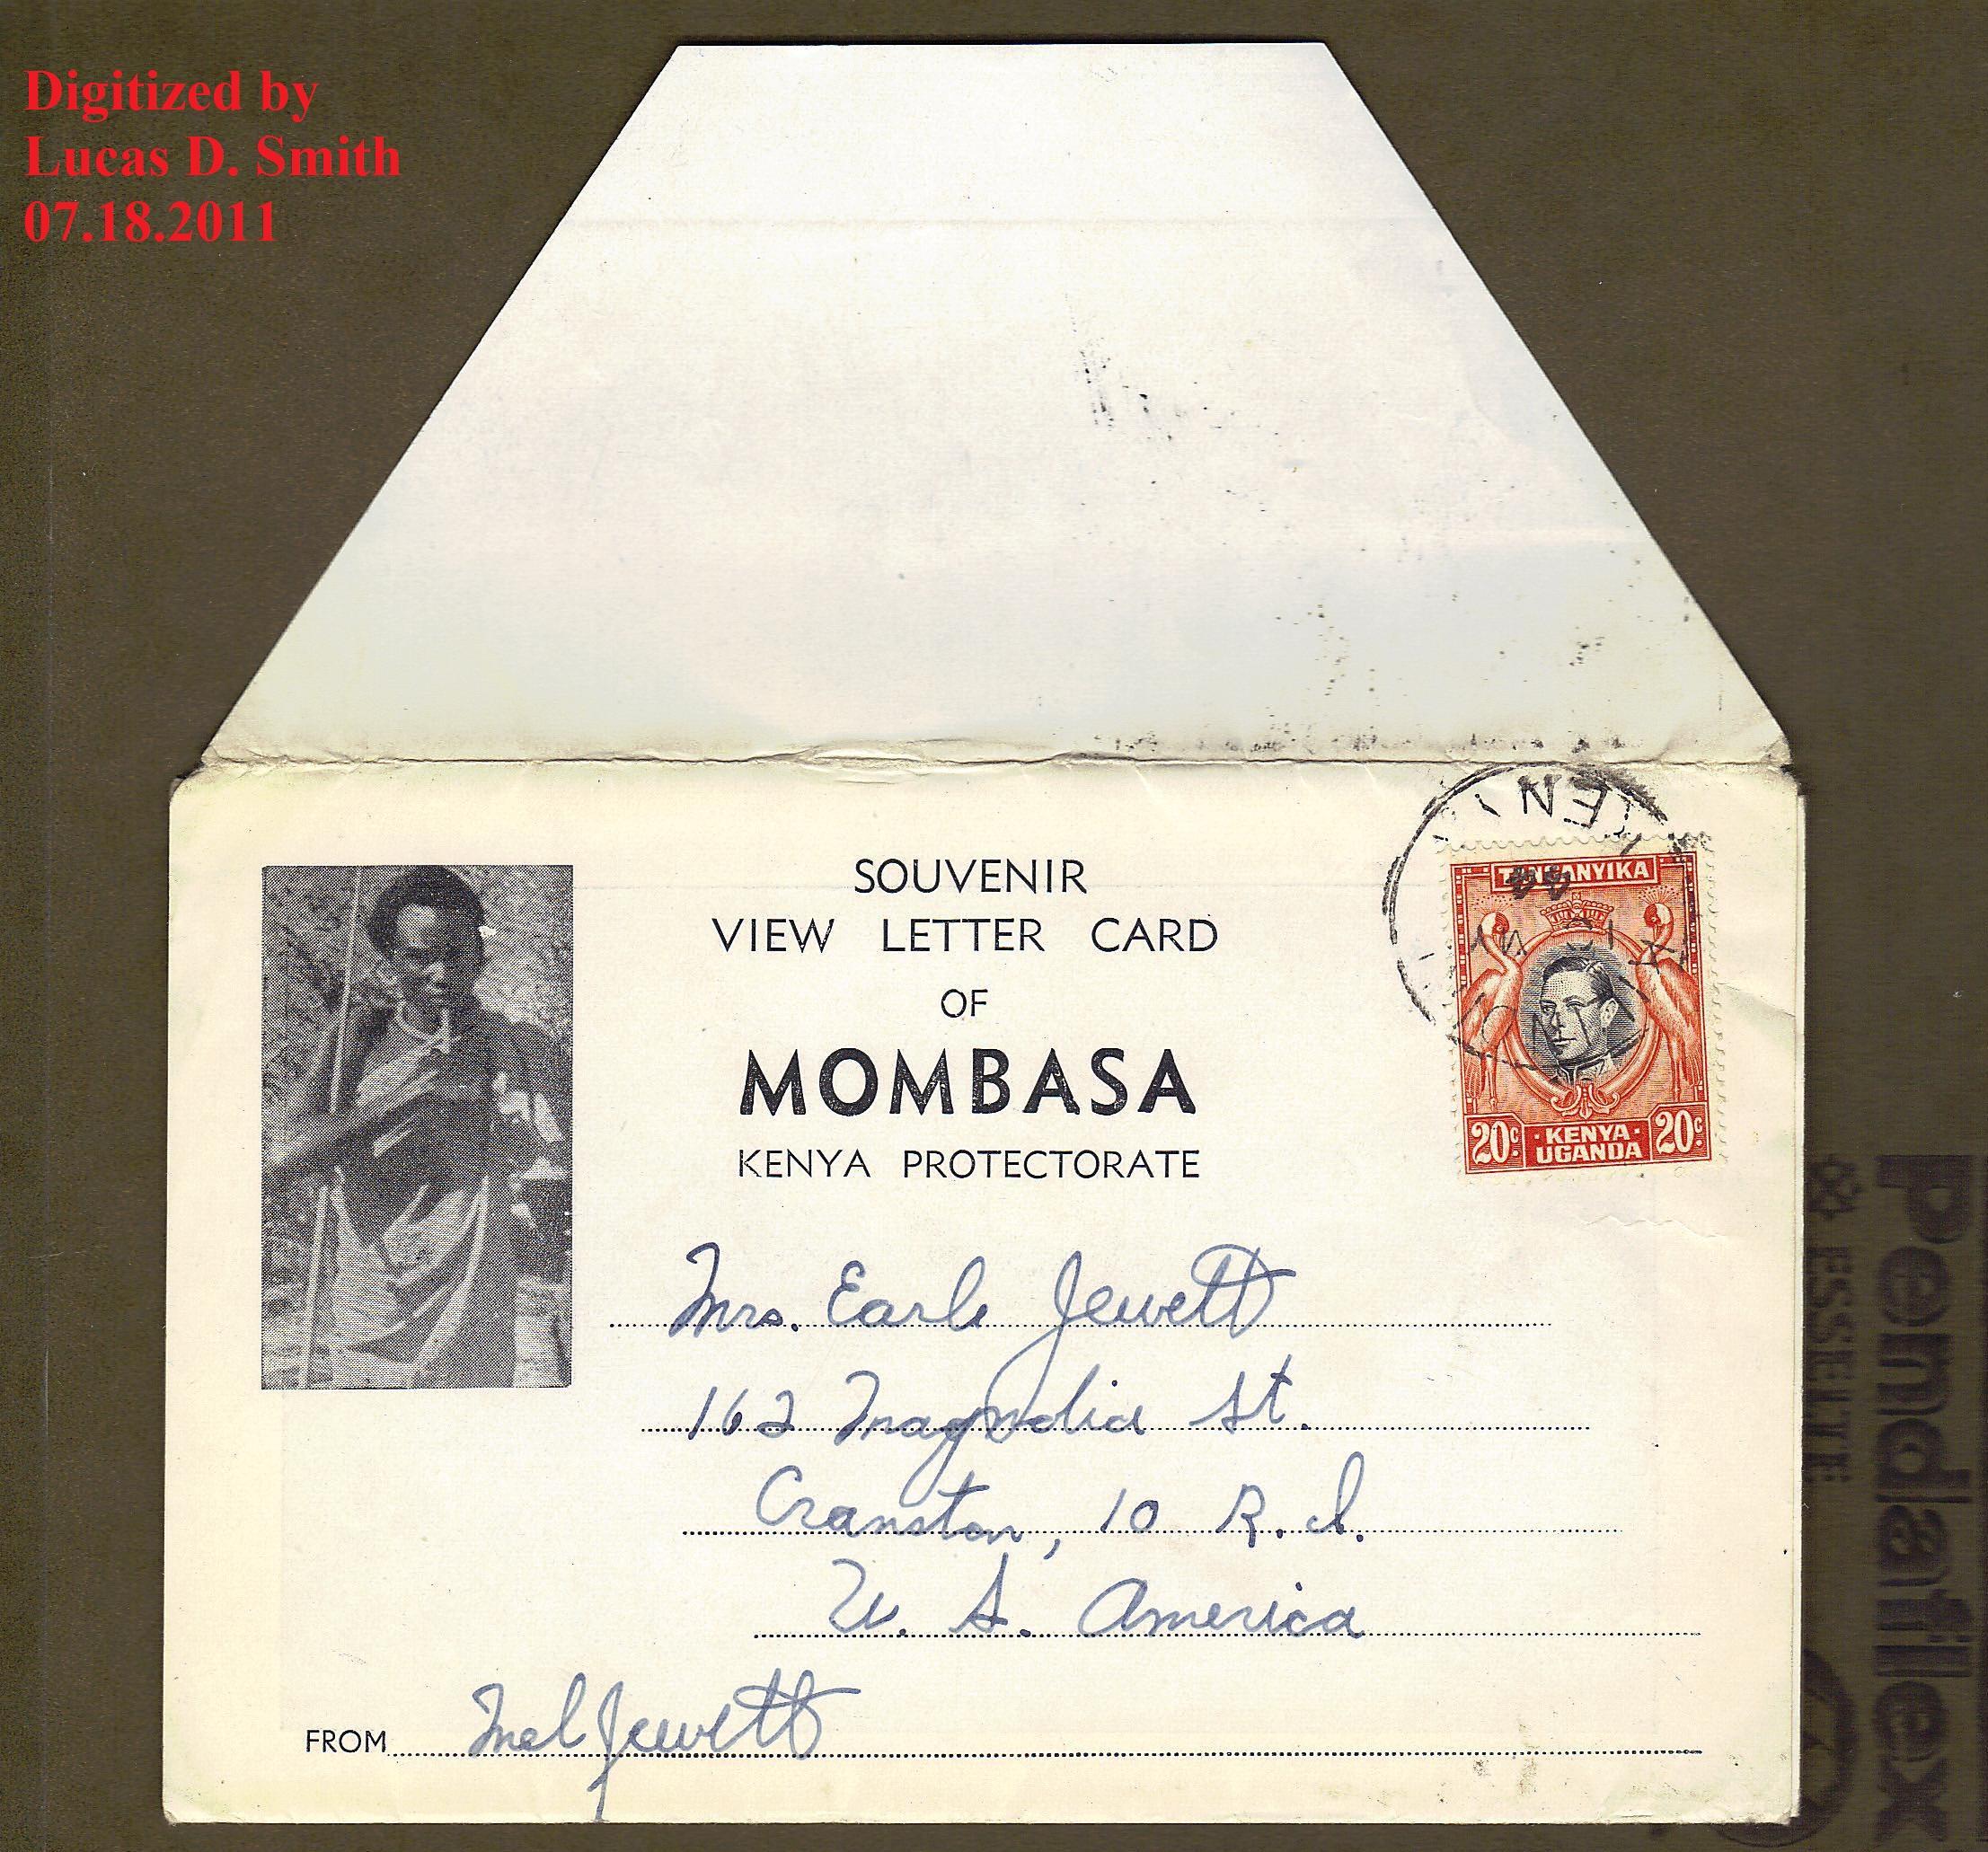 American woman who gave birth in 2014 at aga khan hospital in mombasa kenya protectorate postmark 1944 aiddatafo Image collections